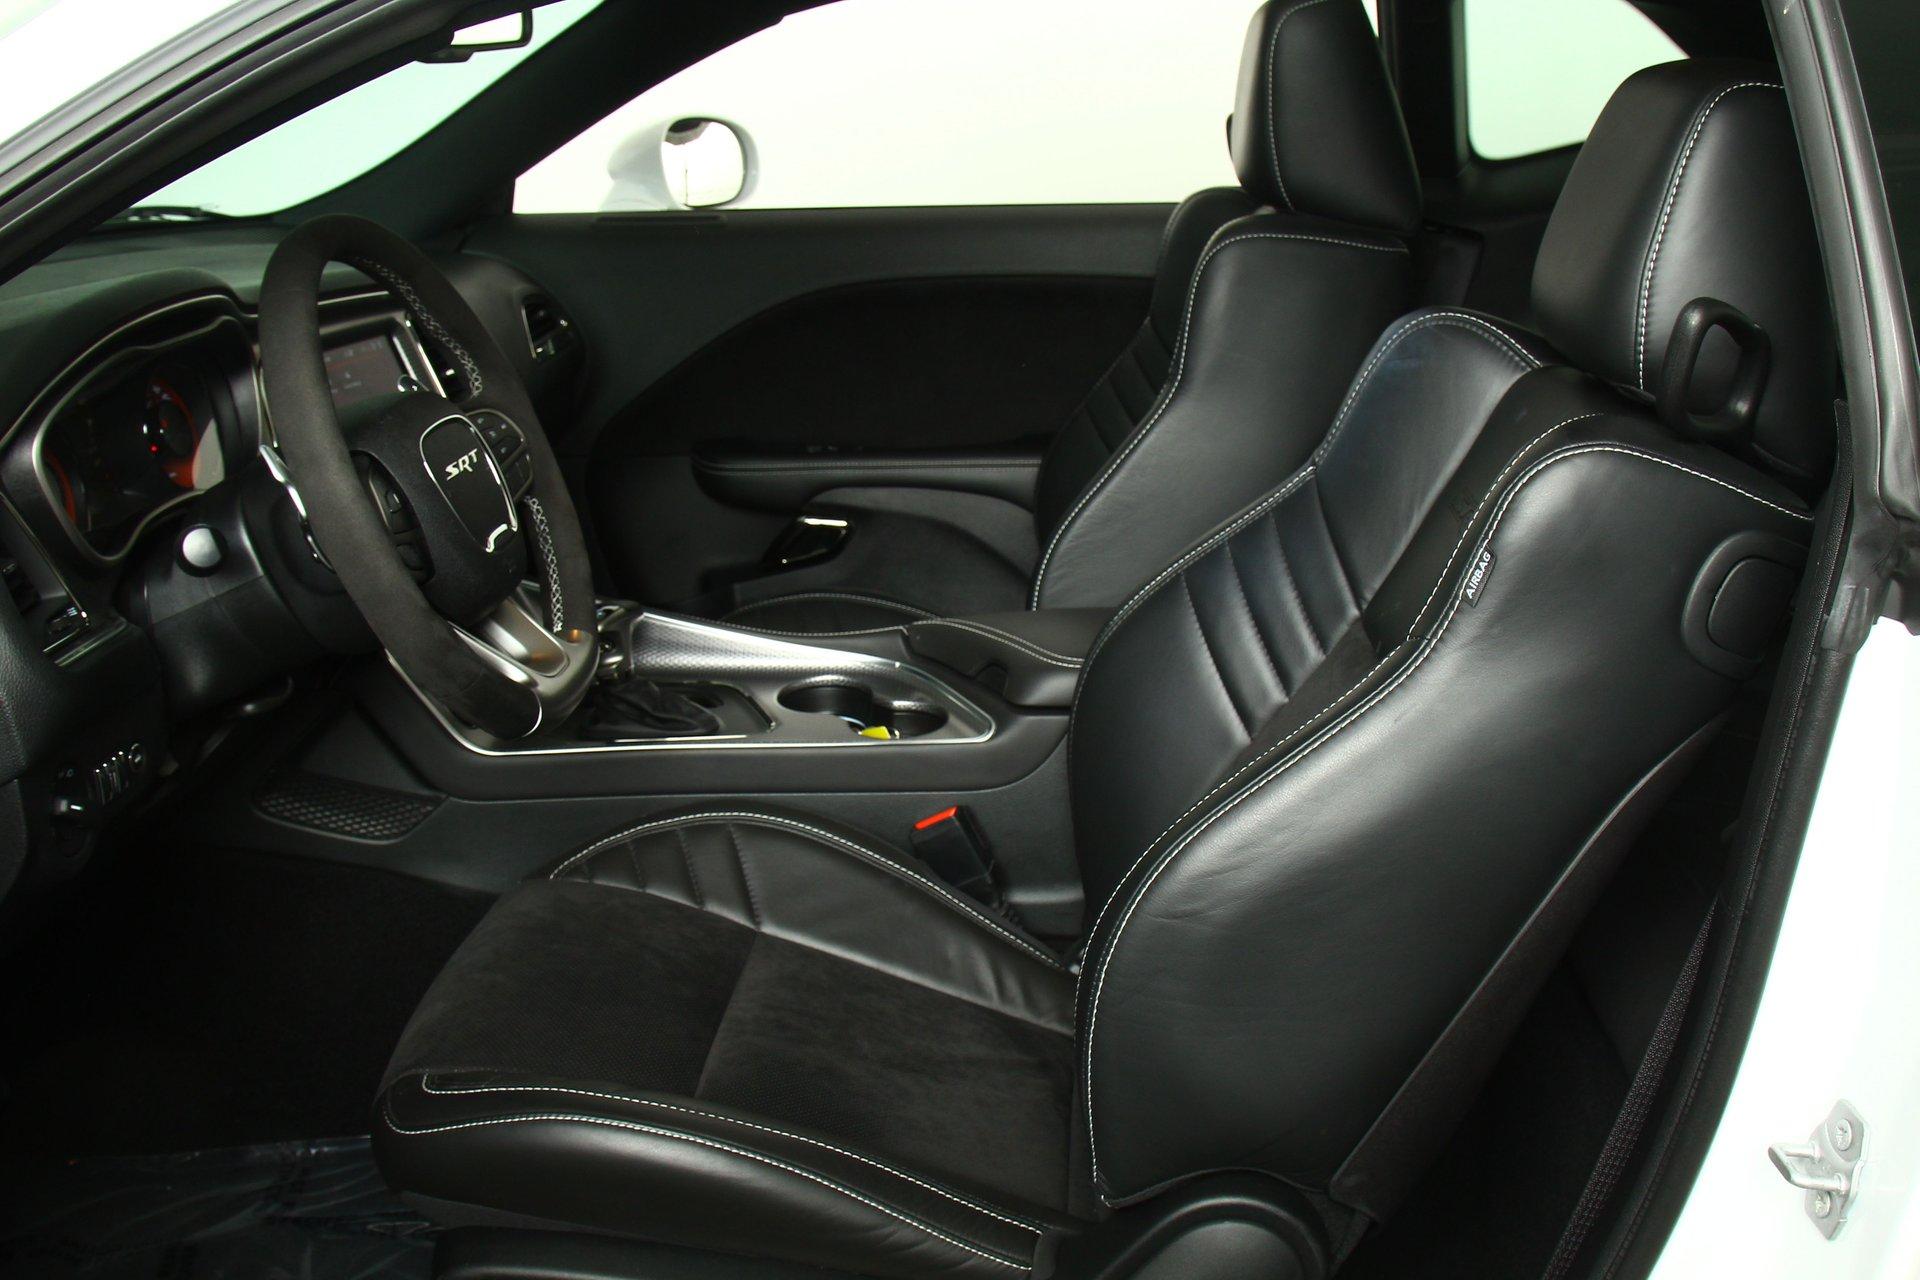 2019 Dodge Hellcat